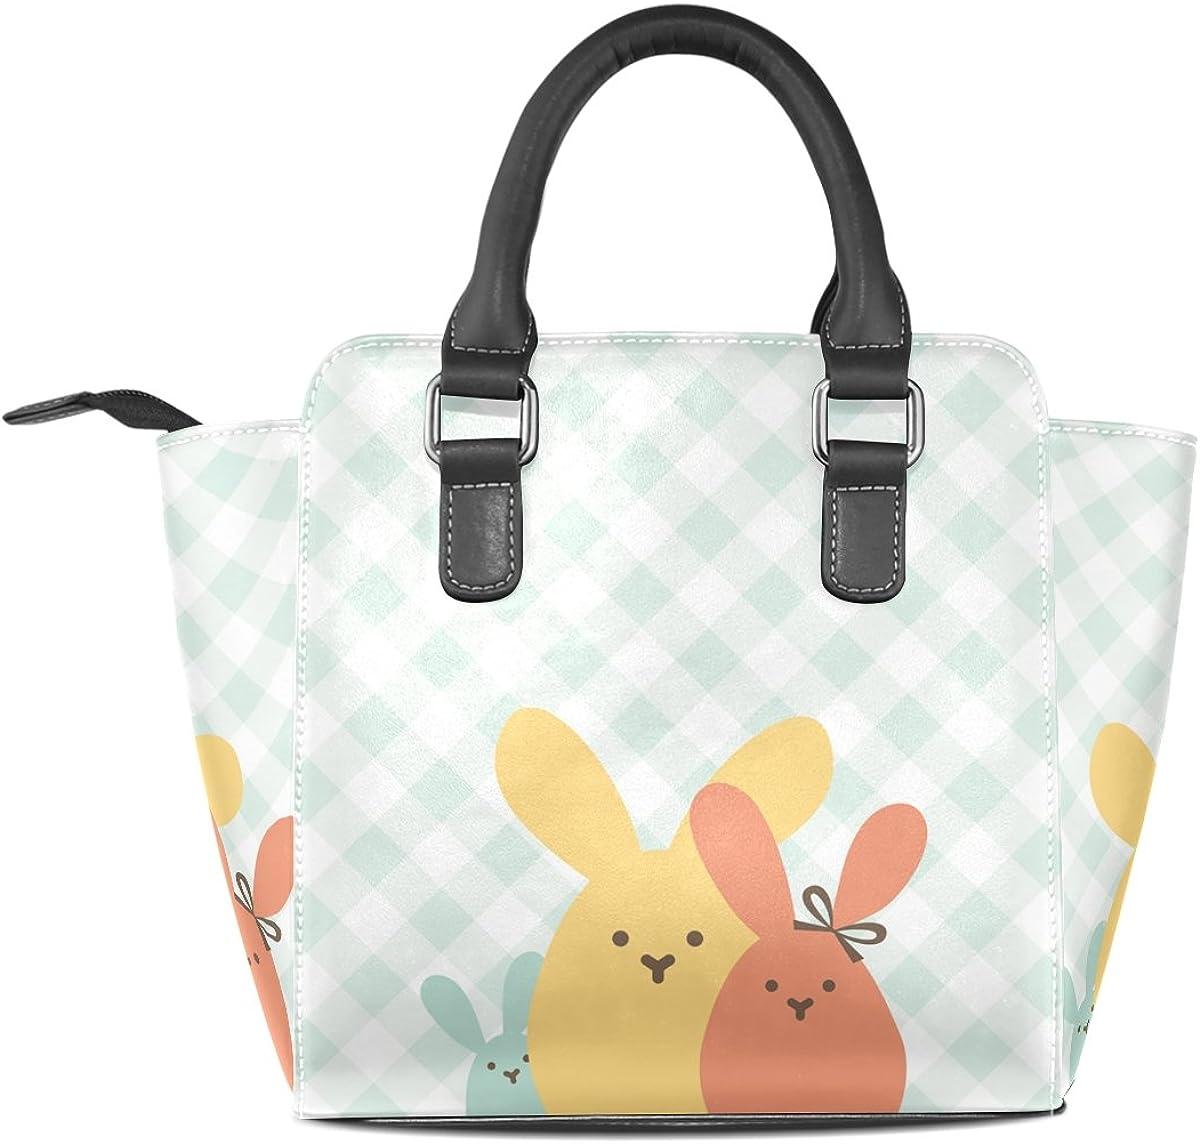 Cute Cartoon Rabbit Leather Handbags Purses Shoulder Tote Satchel Bags Womens